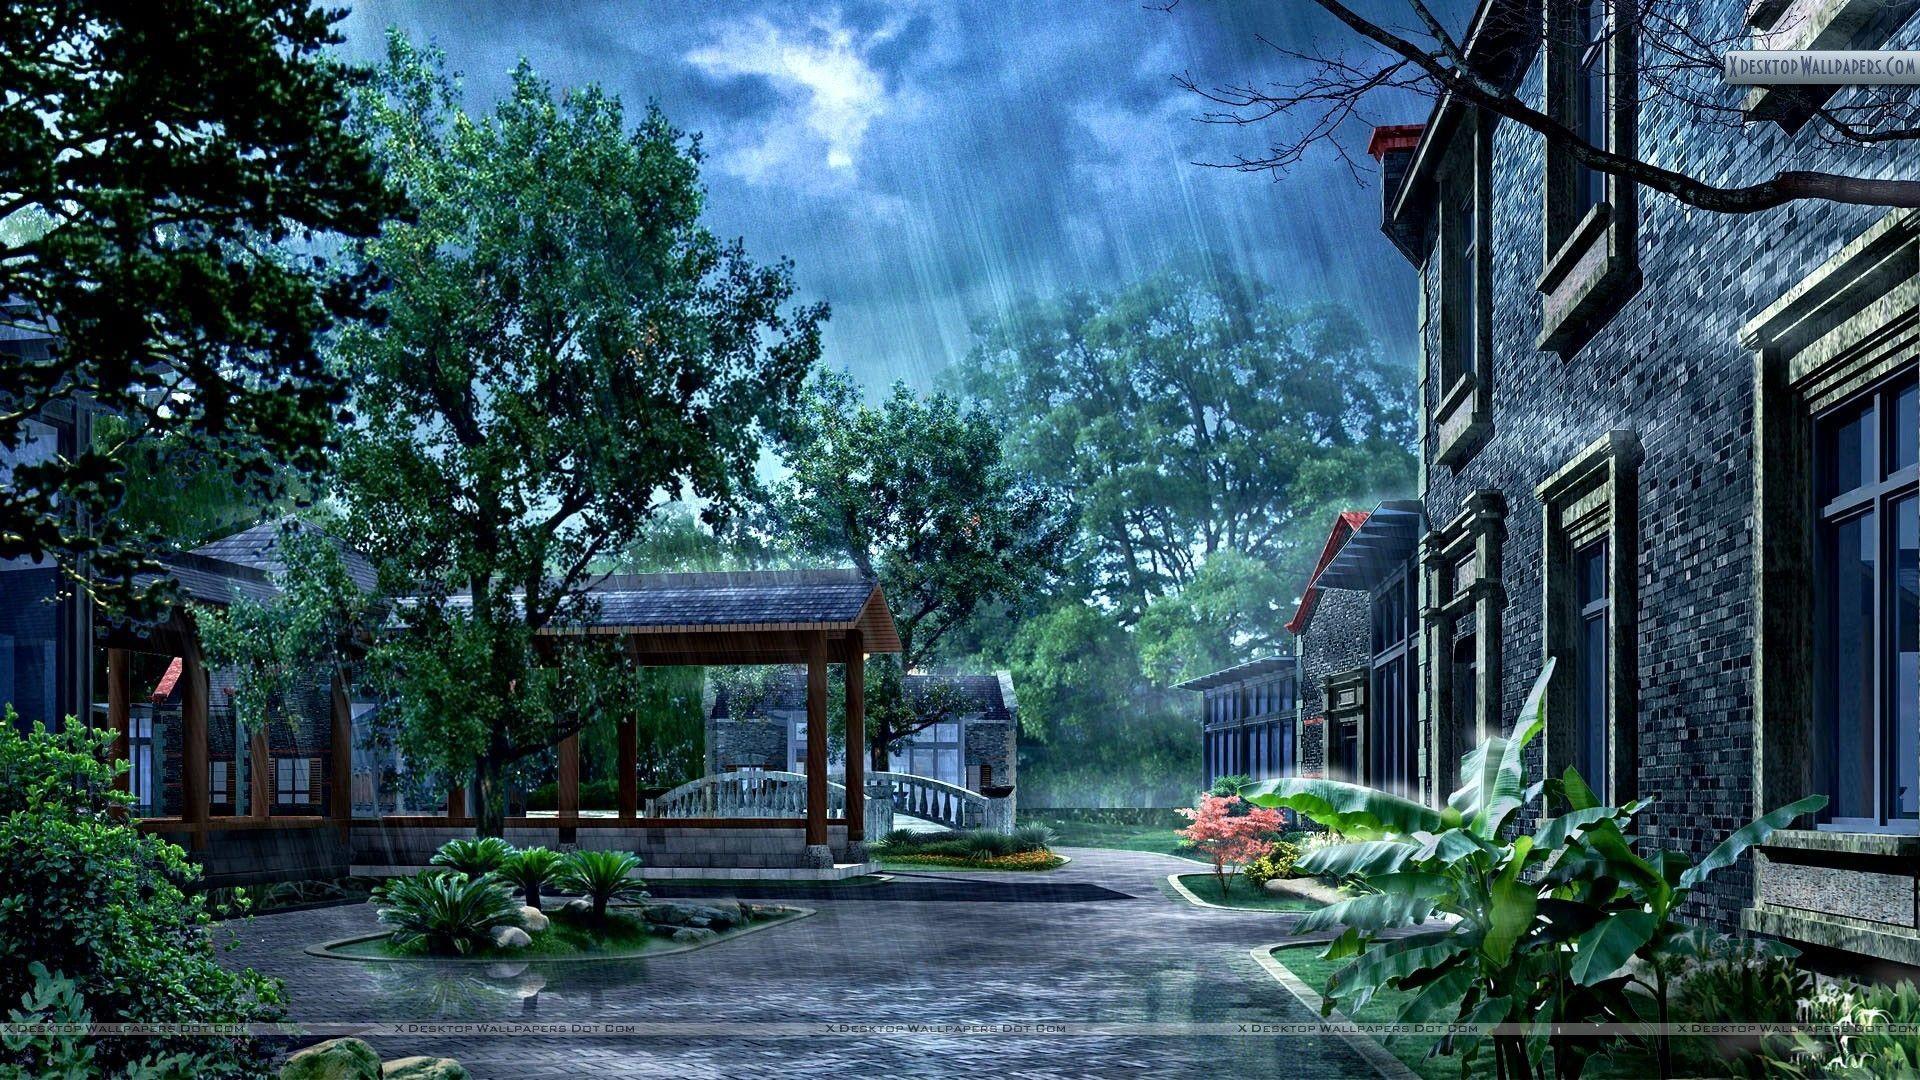 Rainy Day Wallpaper 1920×1440 Rainy Day Images Wallpapers (43 Wallpapers)    Adorable Wallpapers   Wallpapers   Pinterest   Wallpaper